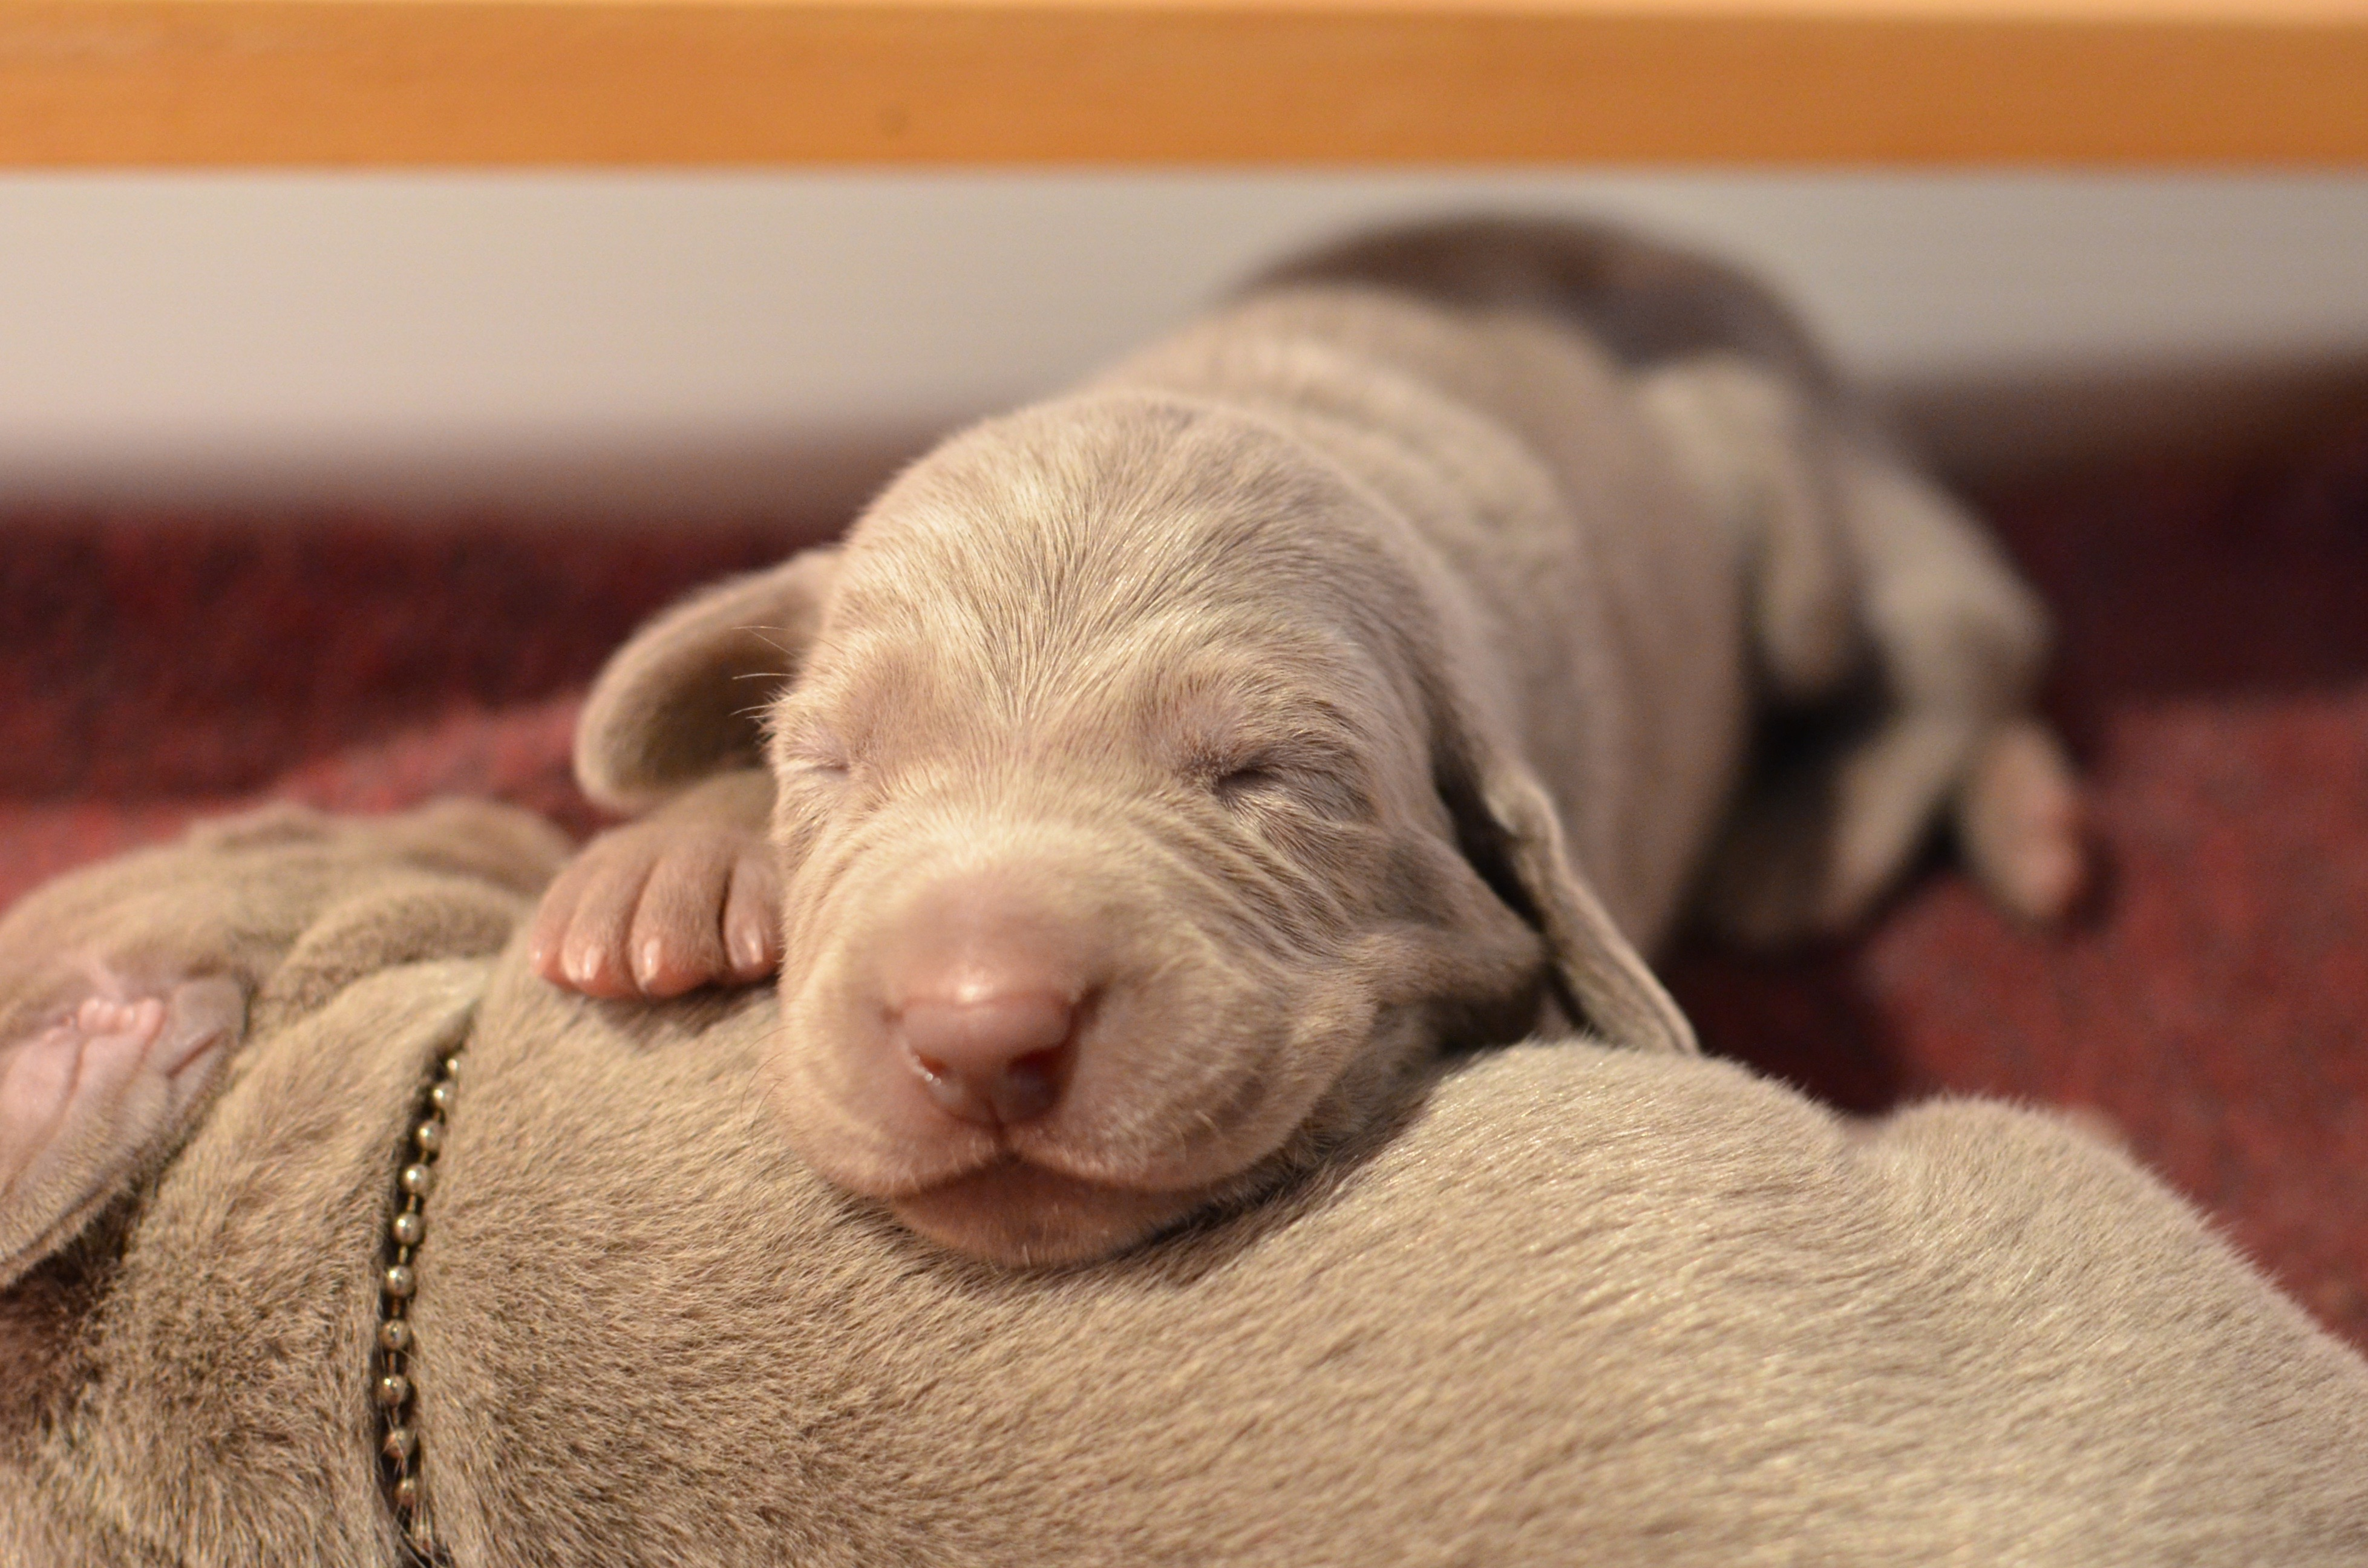 Blue boy - 10 days old